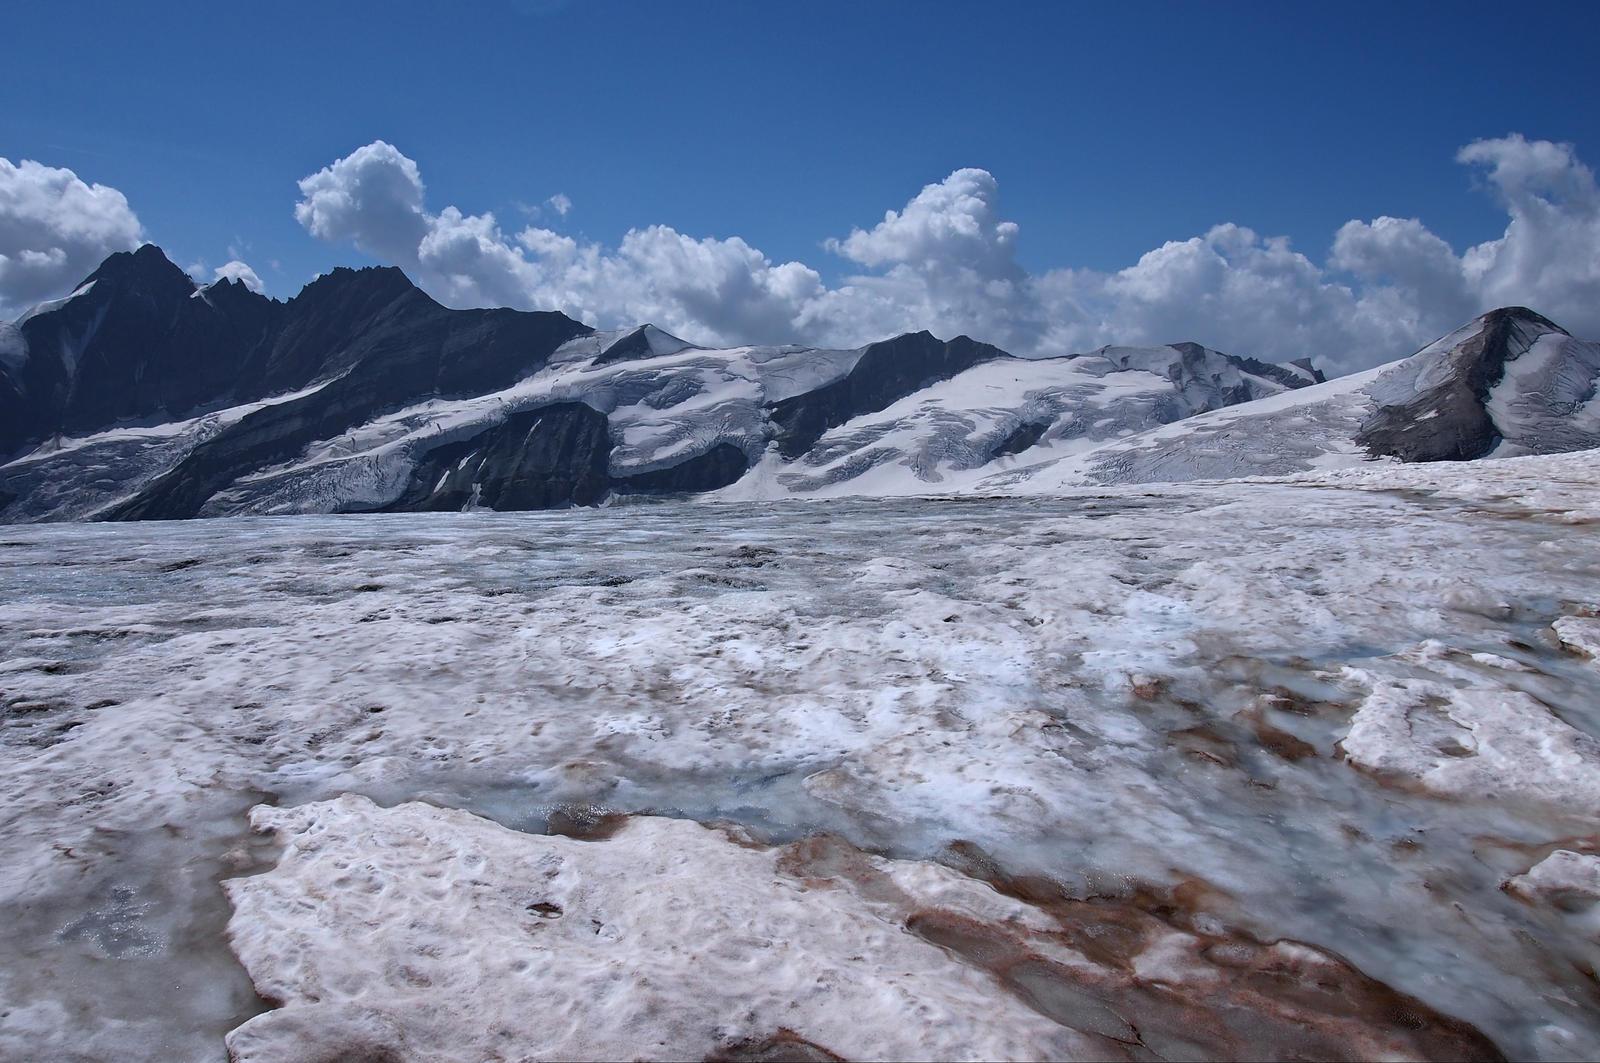 Desert Of Ice by Burtn